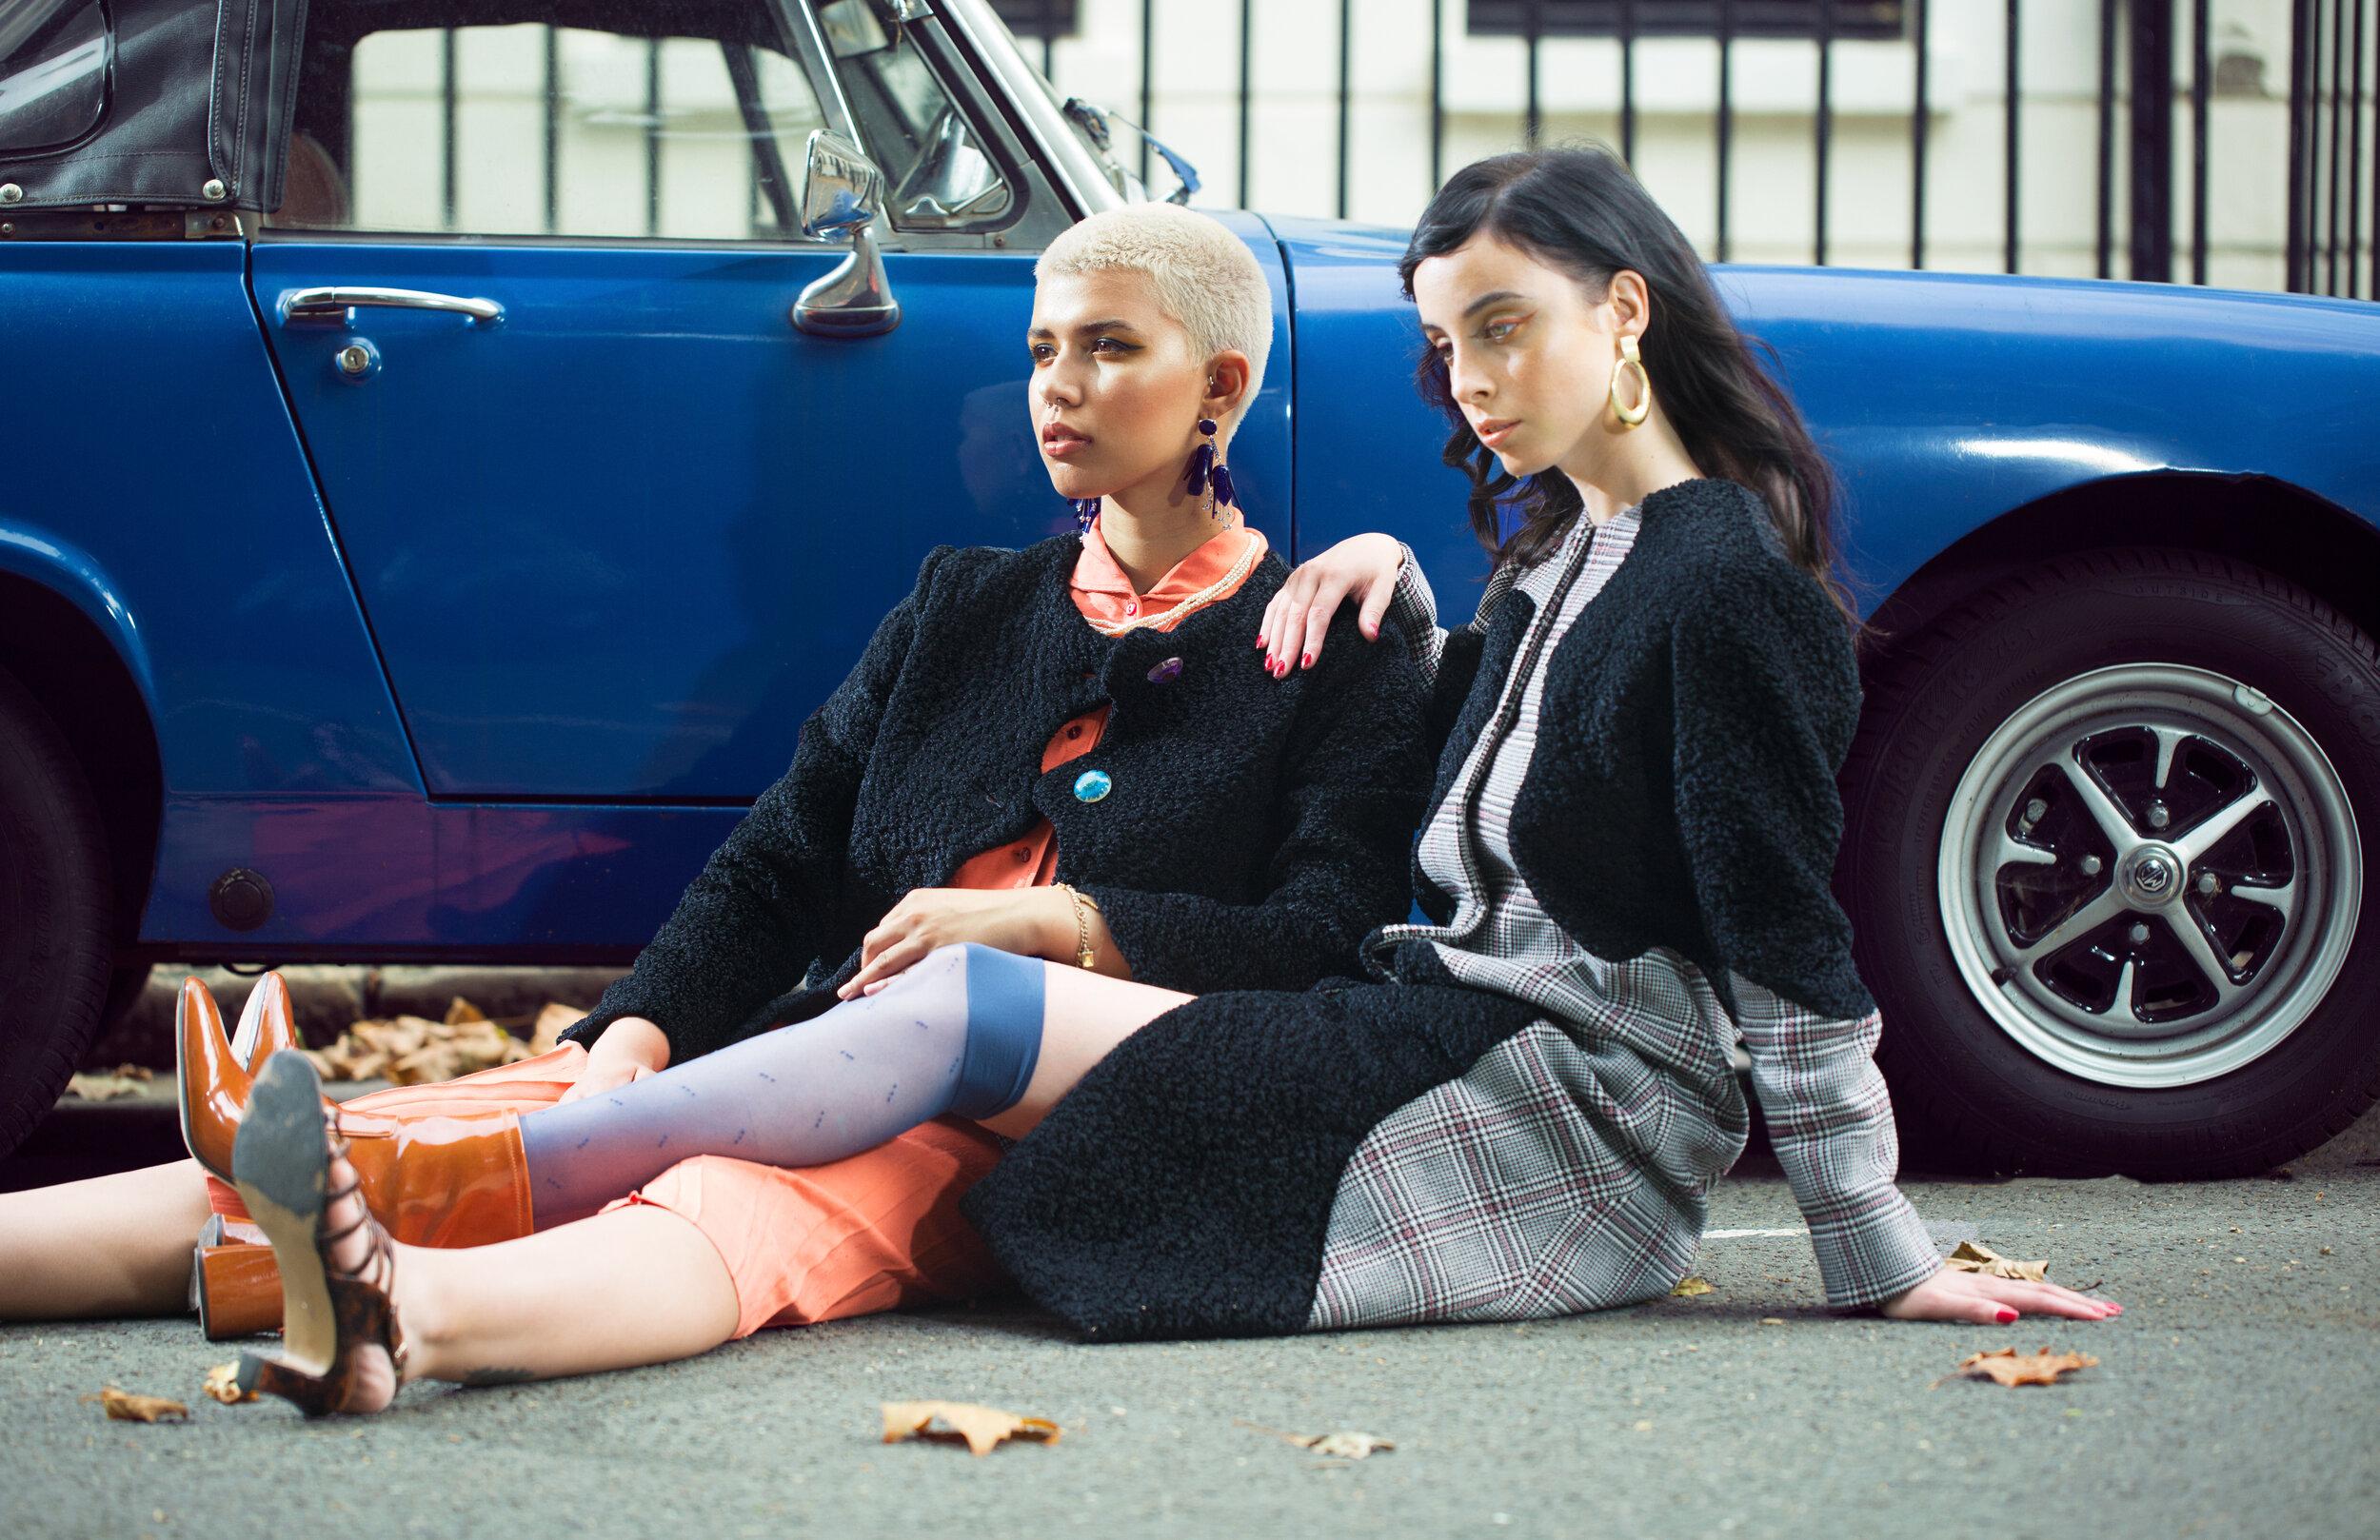 Jewellery&Shoes: Stylist's own Shirt: Eren @atelier_eren Skirt&Tights: Peony Vintage @peonyvintage